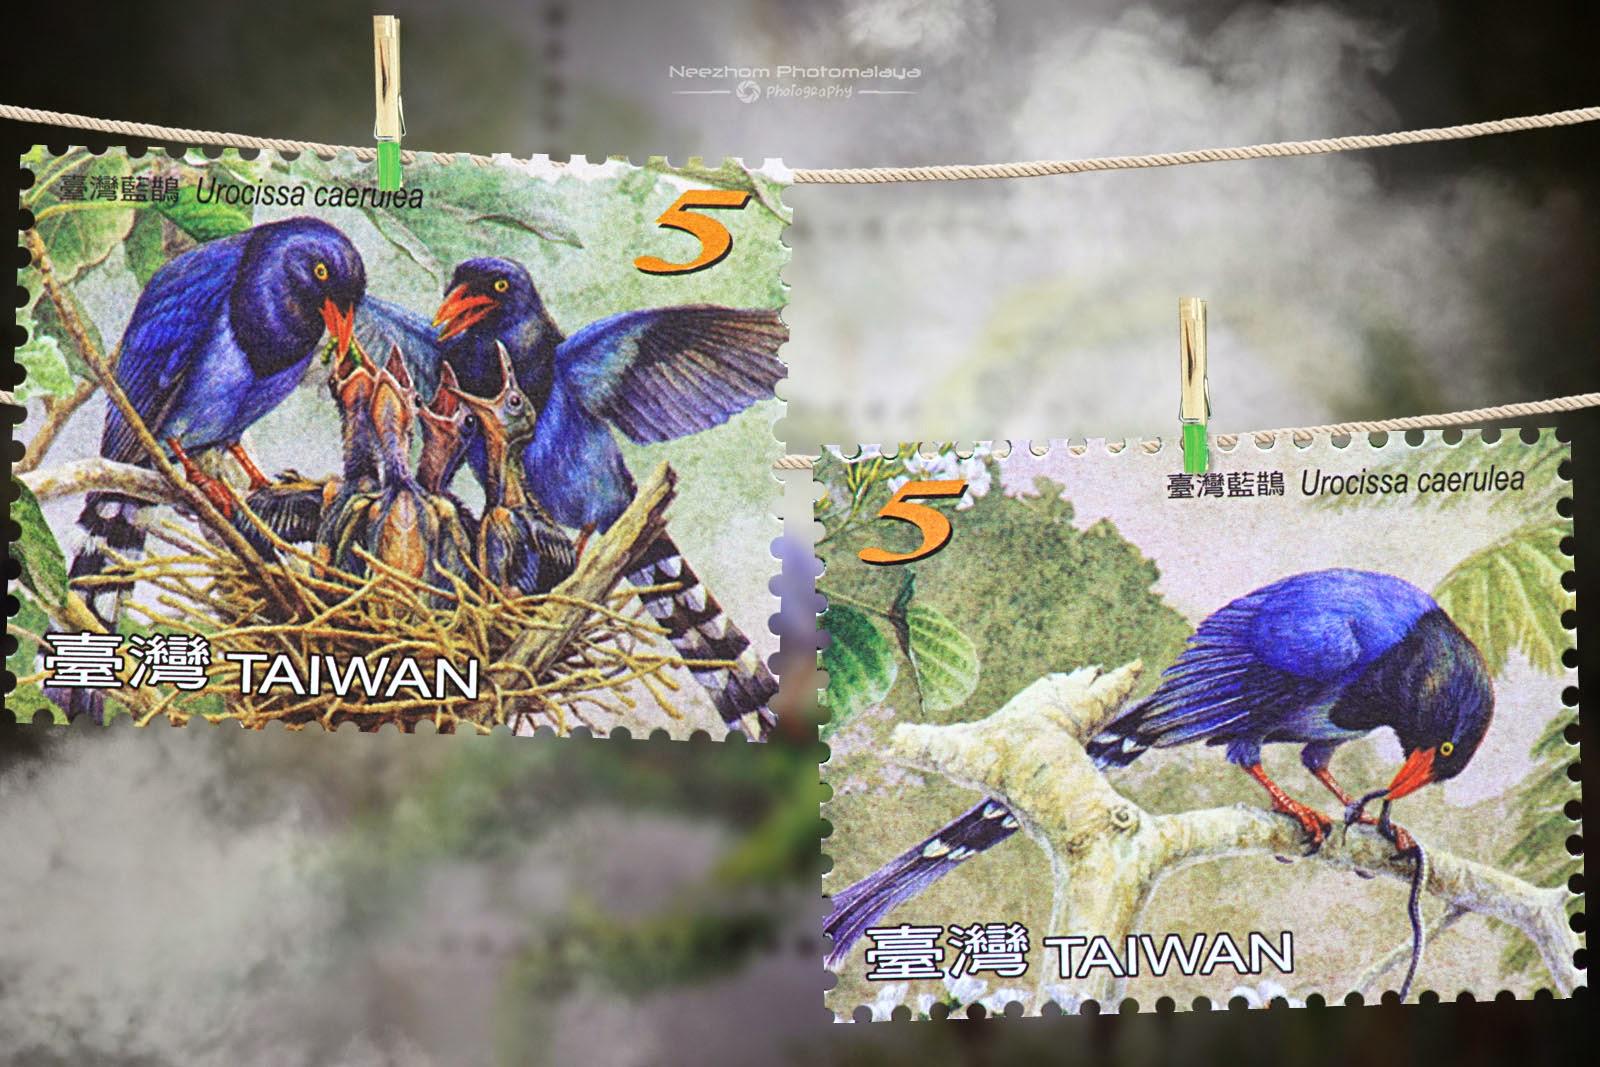 Taiwan 2008 Blue Magpie stamp - Urocissa caerulea NT$5